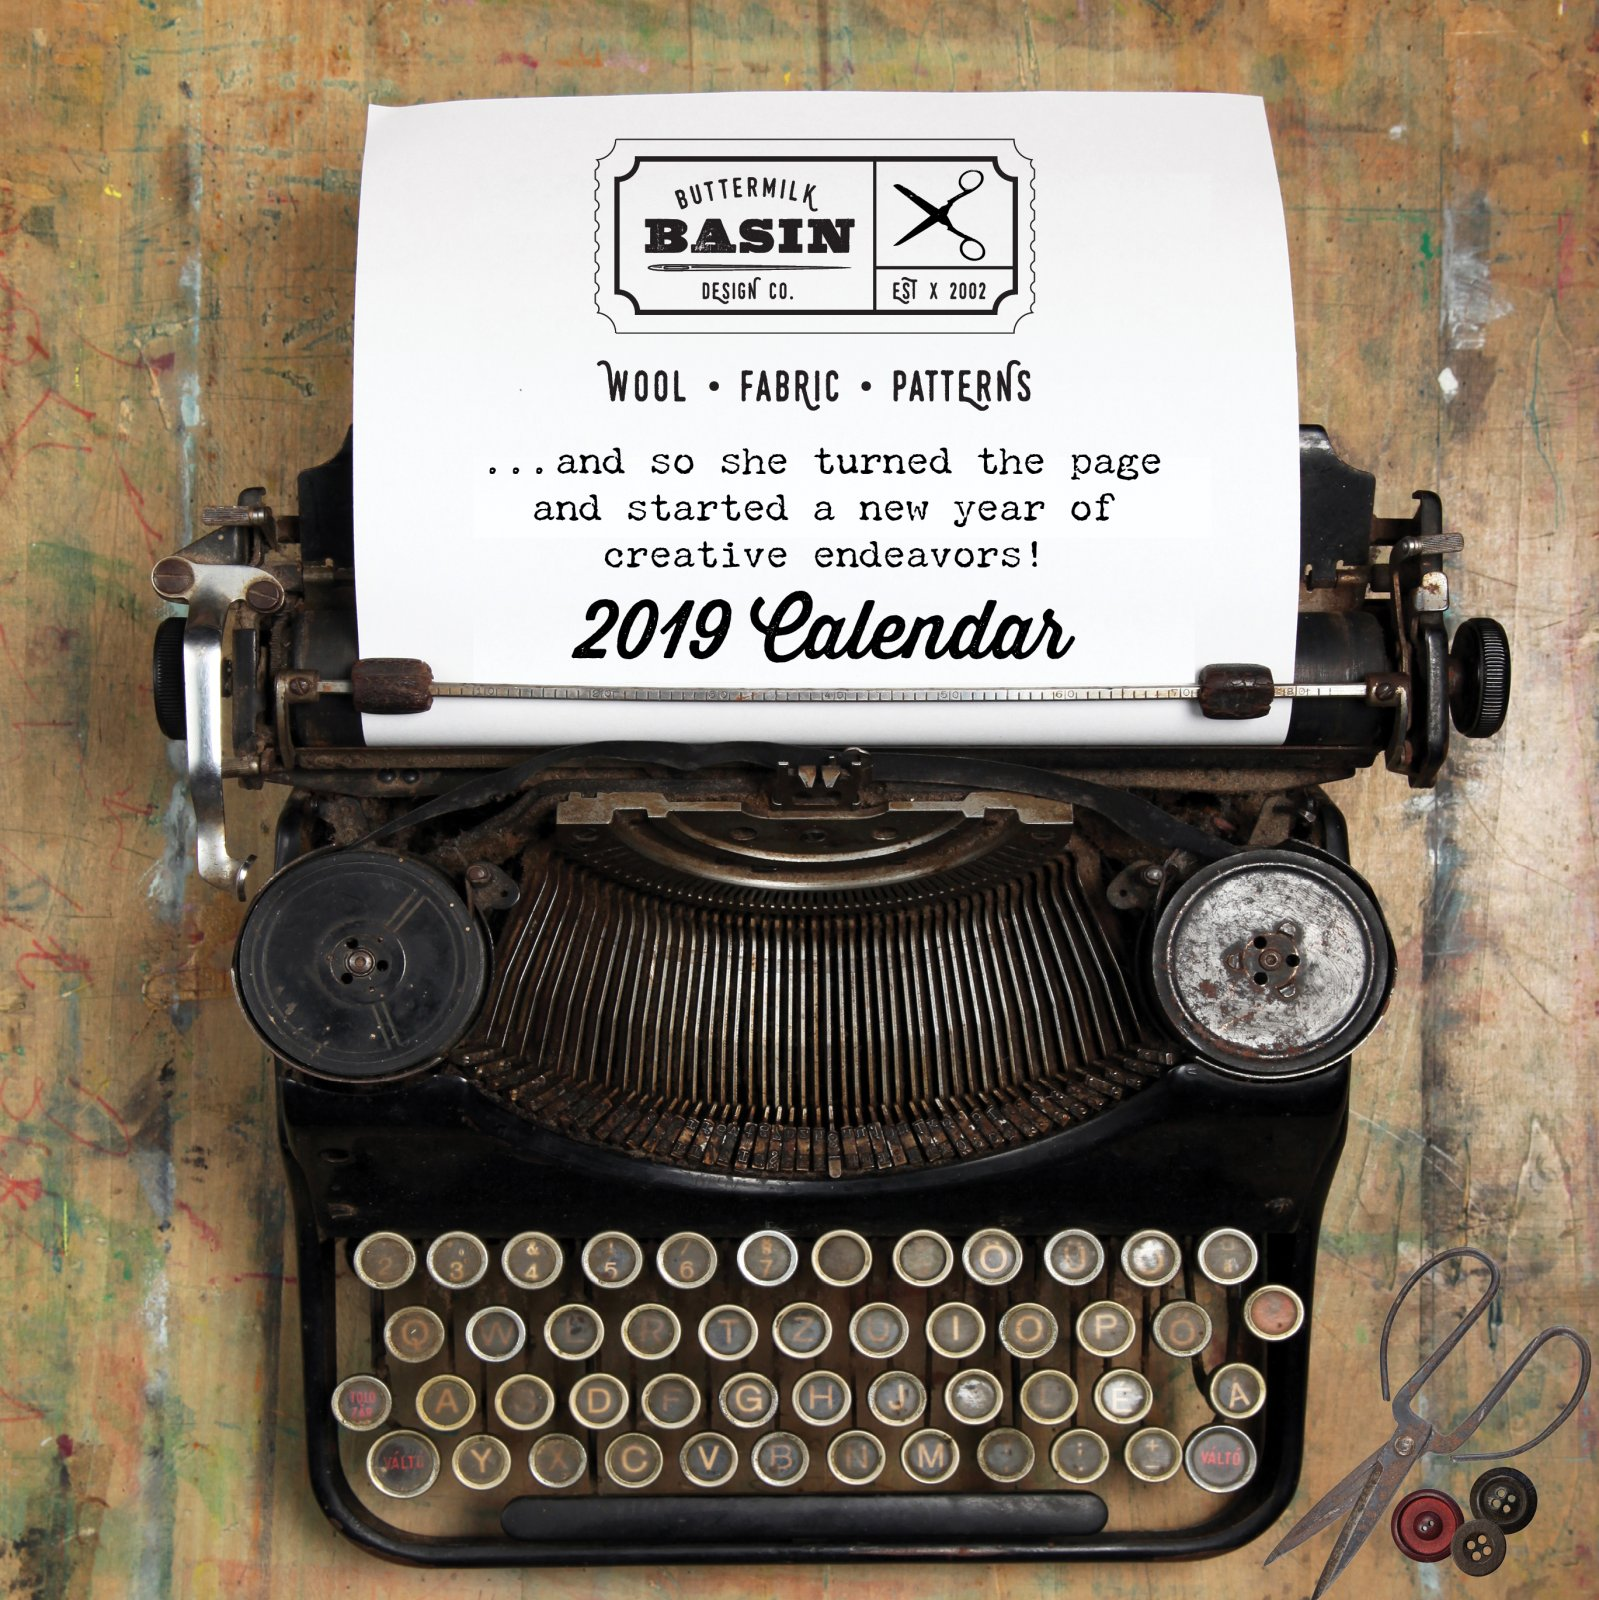 Buttermilk Basin 2019 Calendar